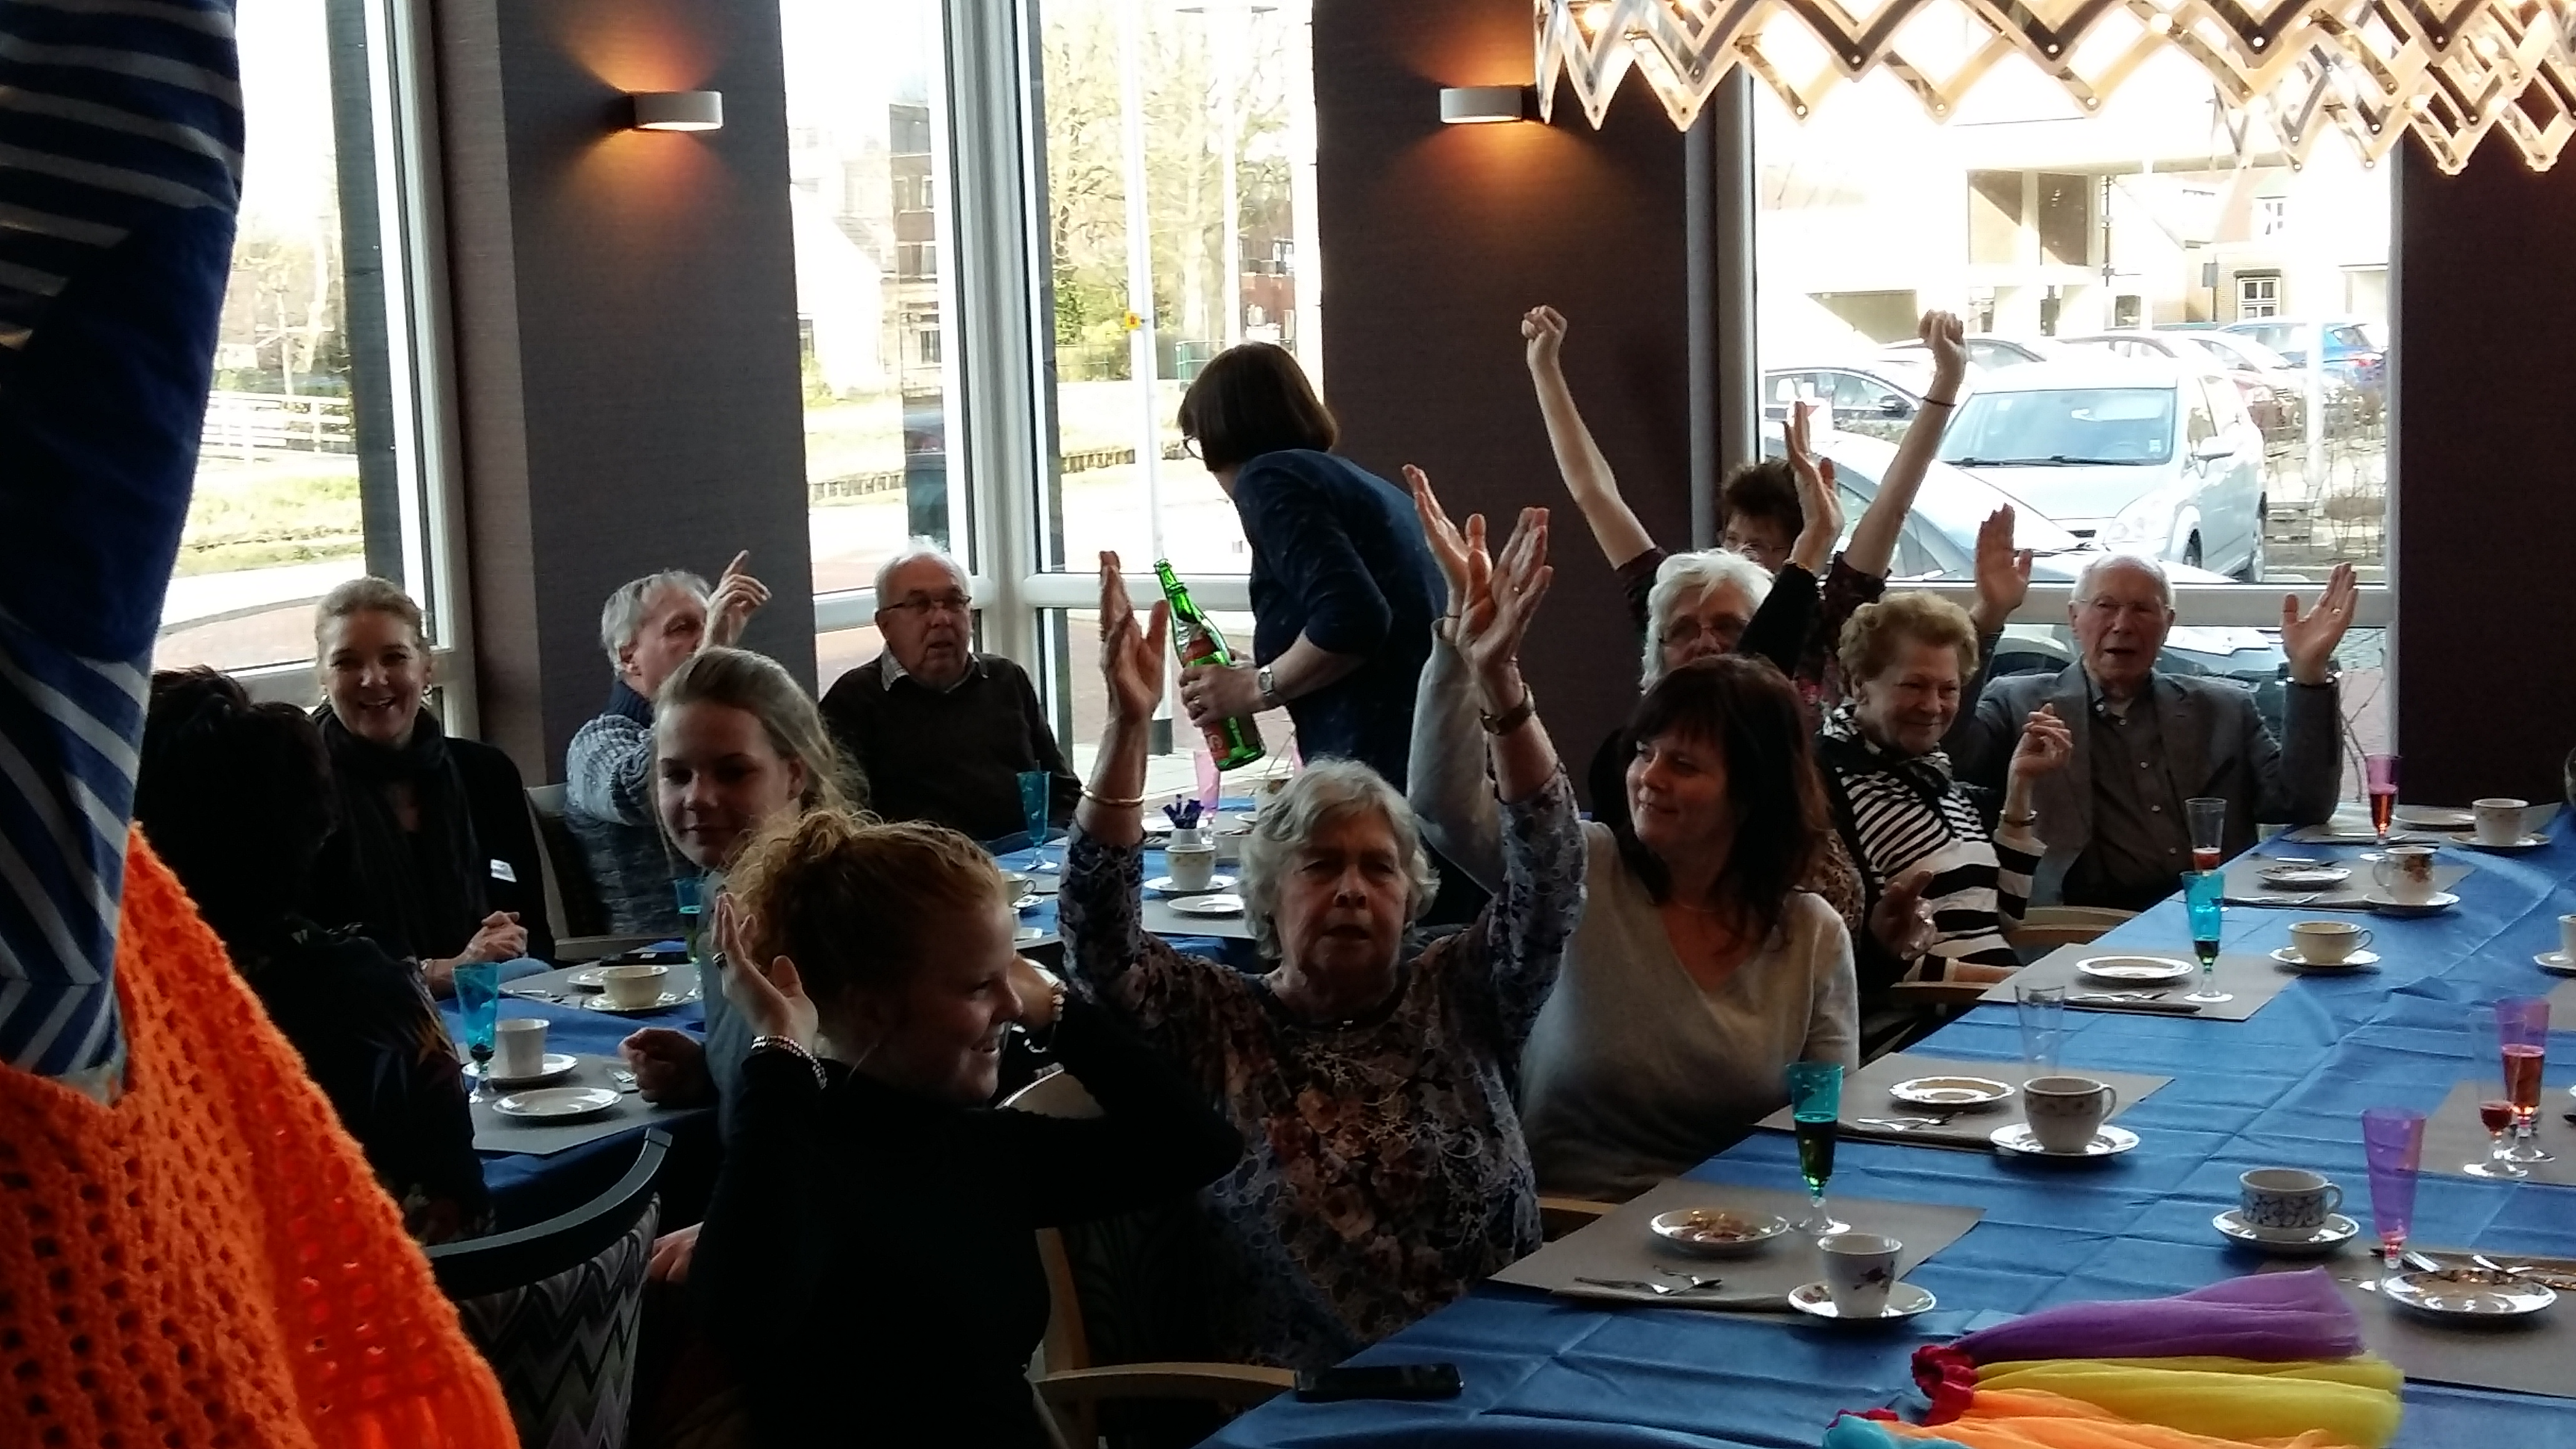 20180216_160426_in_het_restaurant.jpg